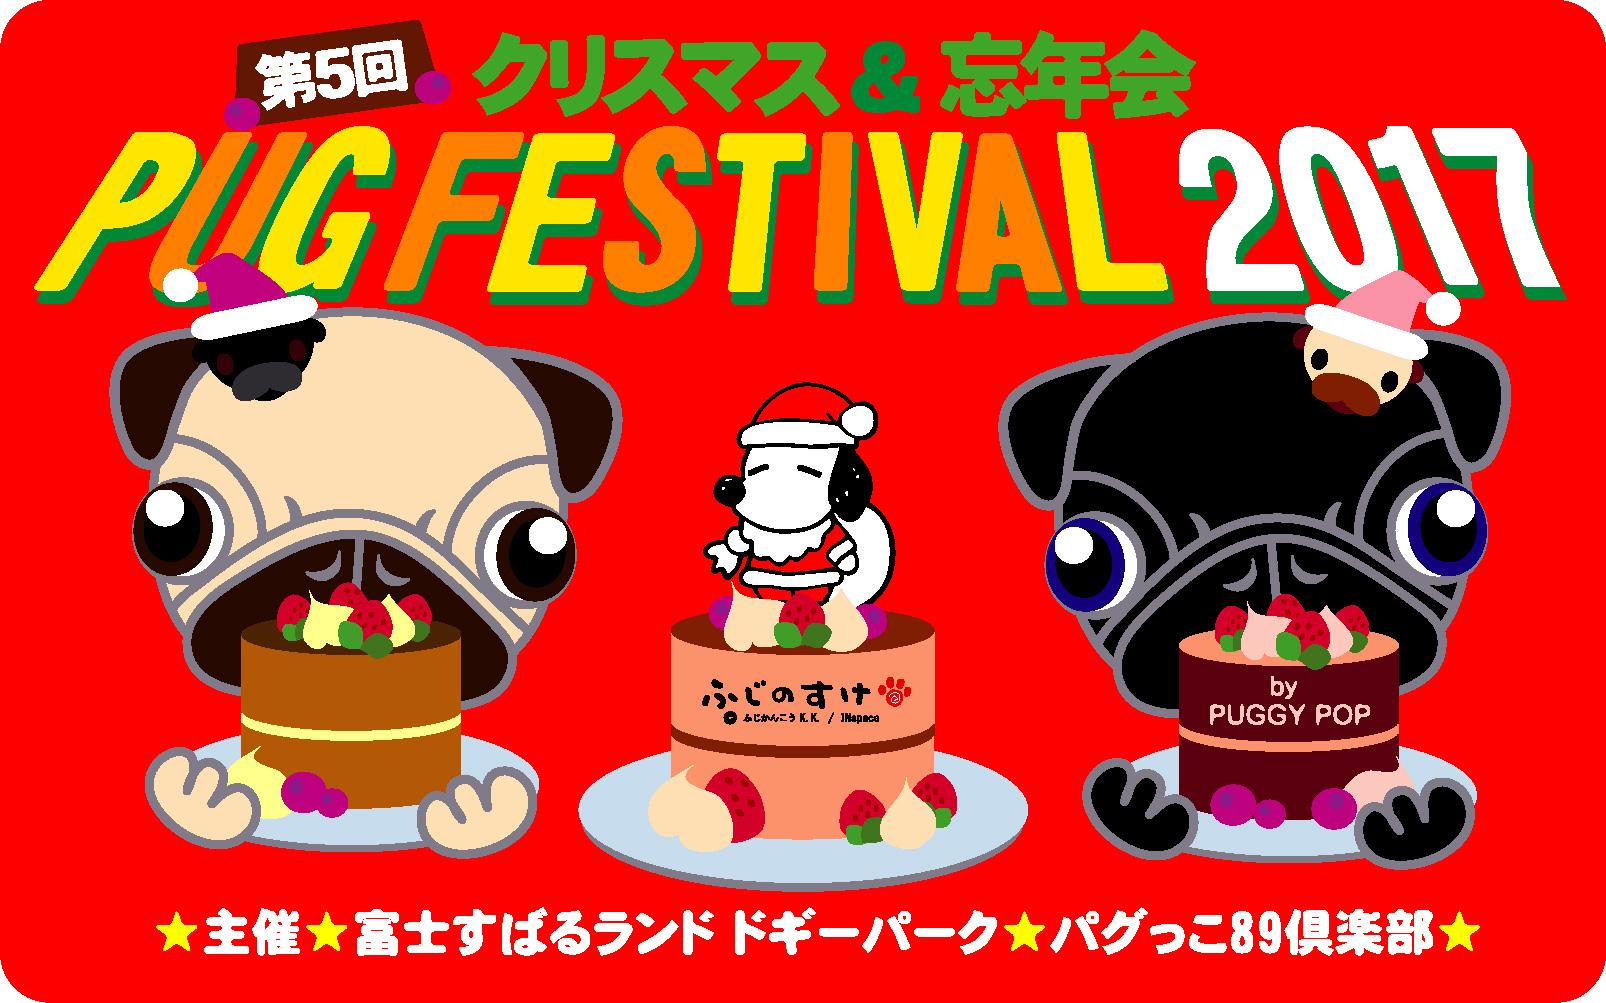 PUG FESTIVAL 2017